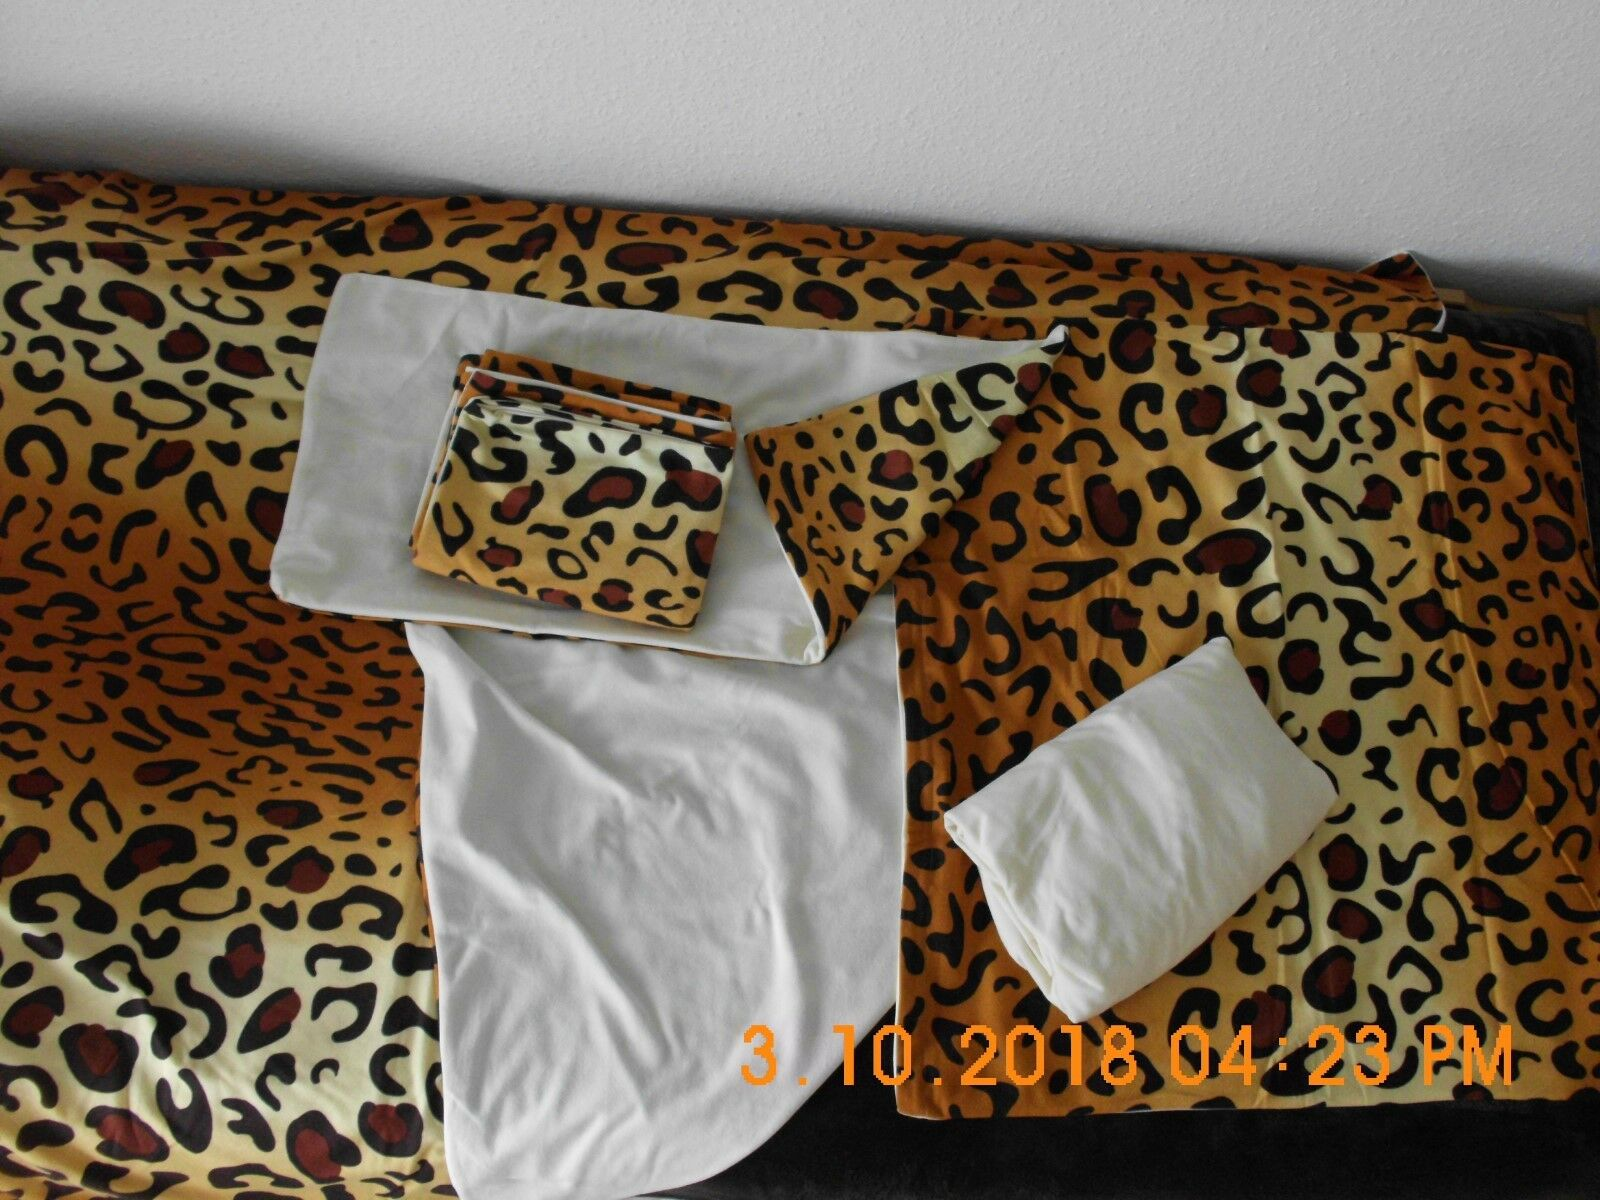 Fleece -Bettwäsche 7-teilig neuwertig mit Reißverschluss   | Fairer Preis